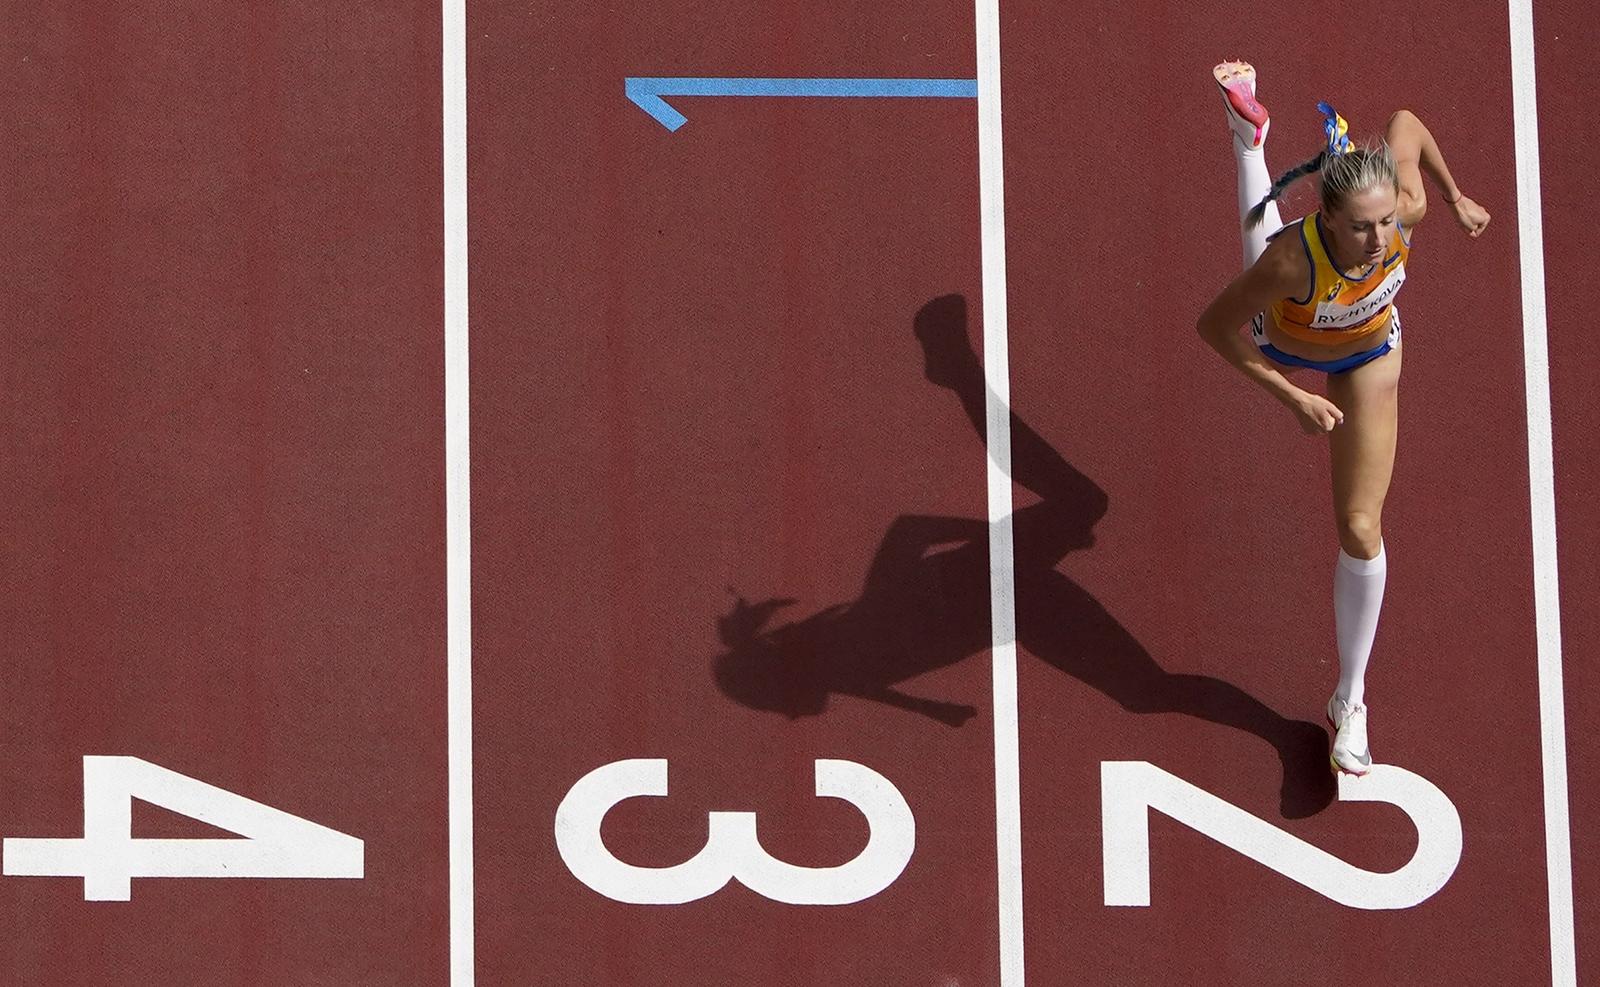 Anna Ryzhykova, of Ukraine, wins her heat in the women's 400-meter hurdles at the 2020 Summer Olympics, Saturday, July 31, 2021, in Tokyo. AP